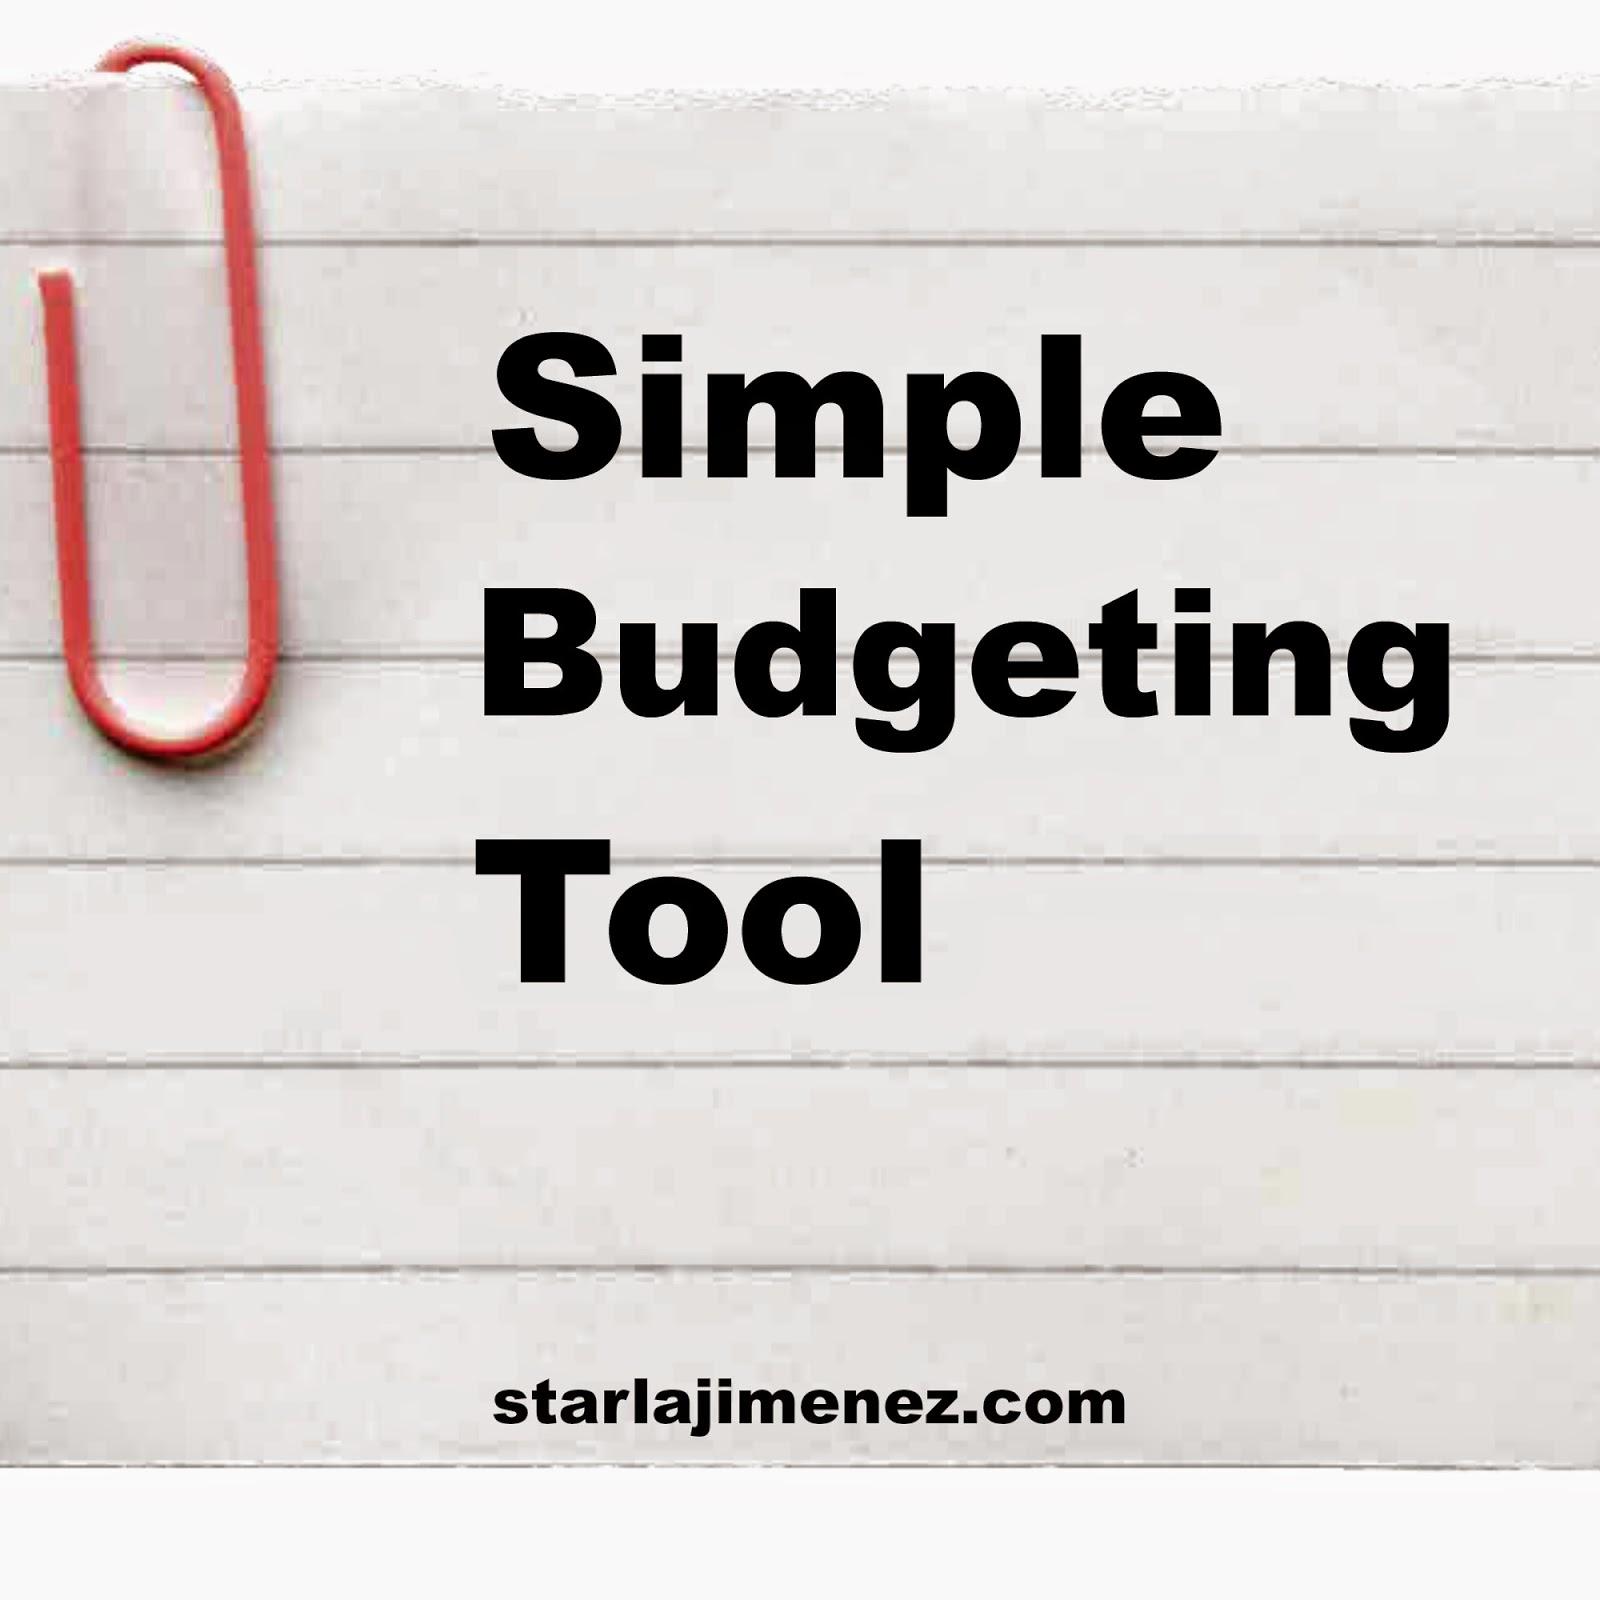 simple budgeting tool